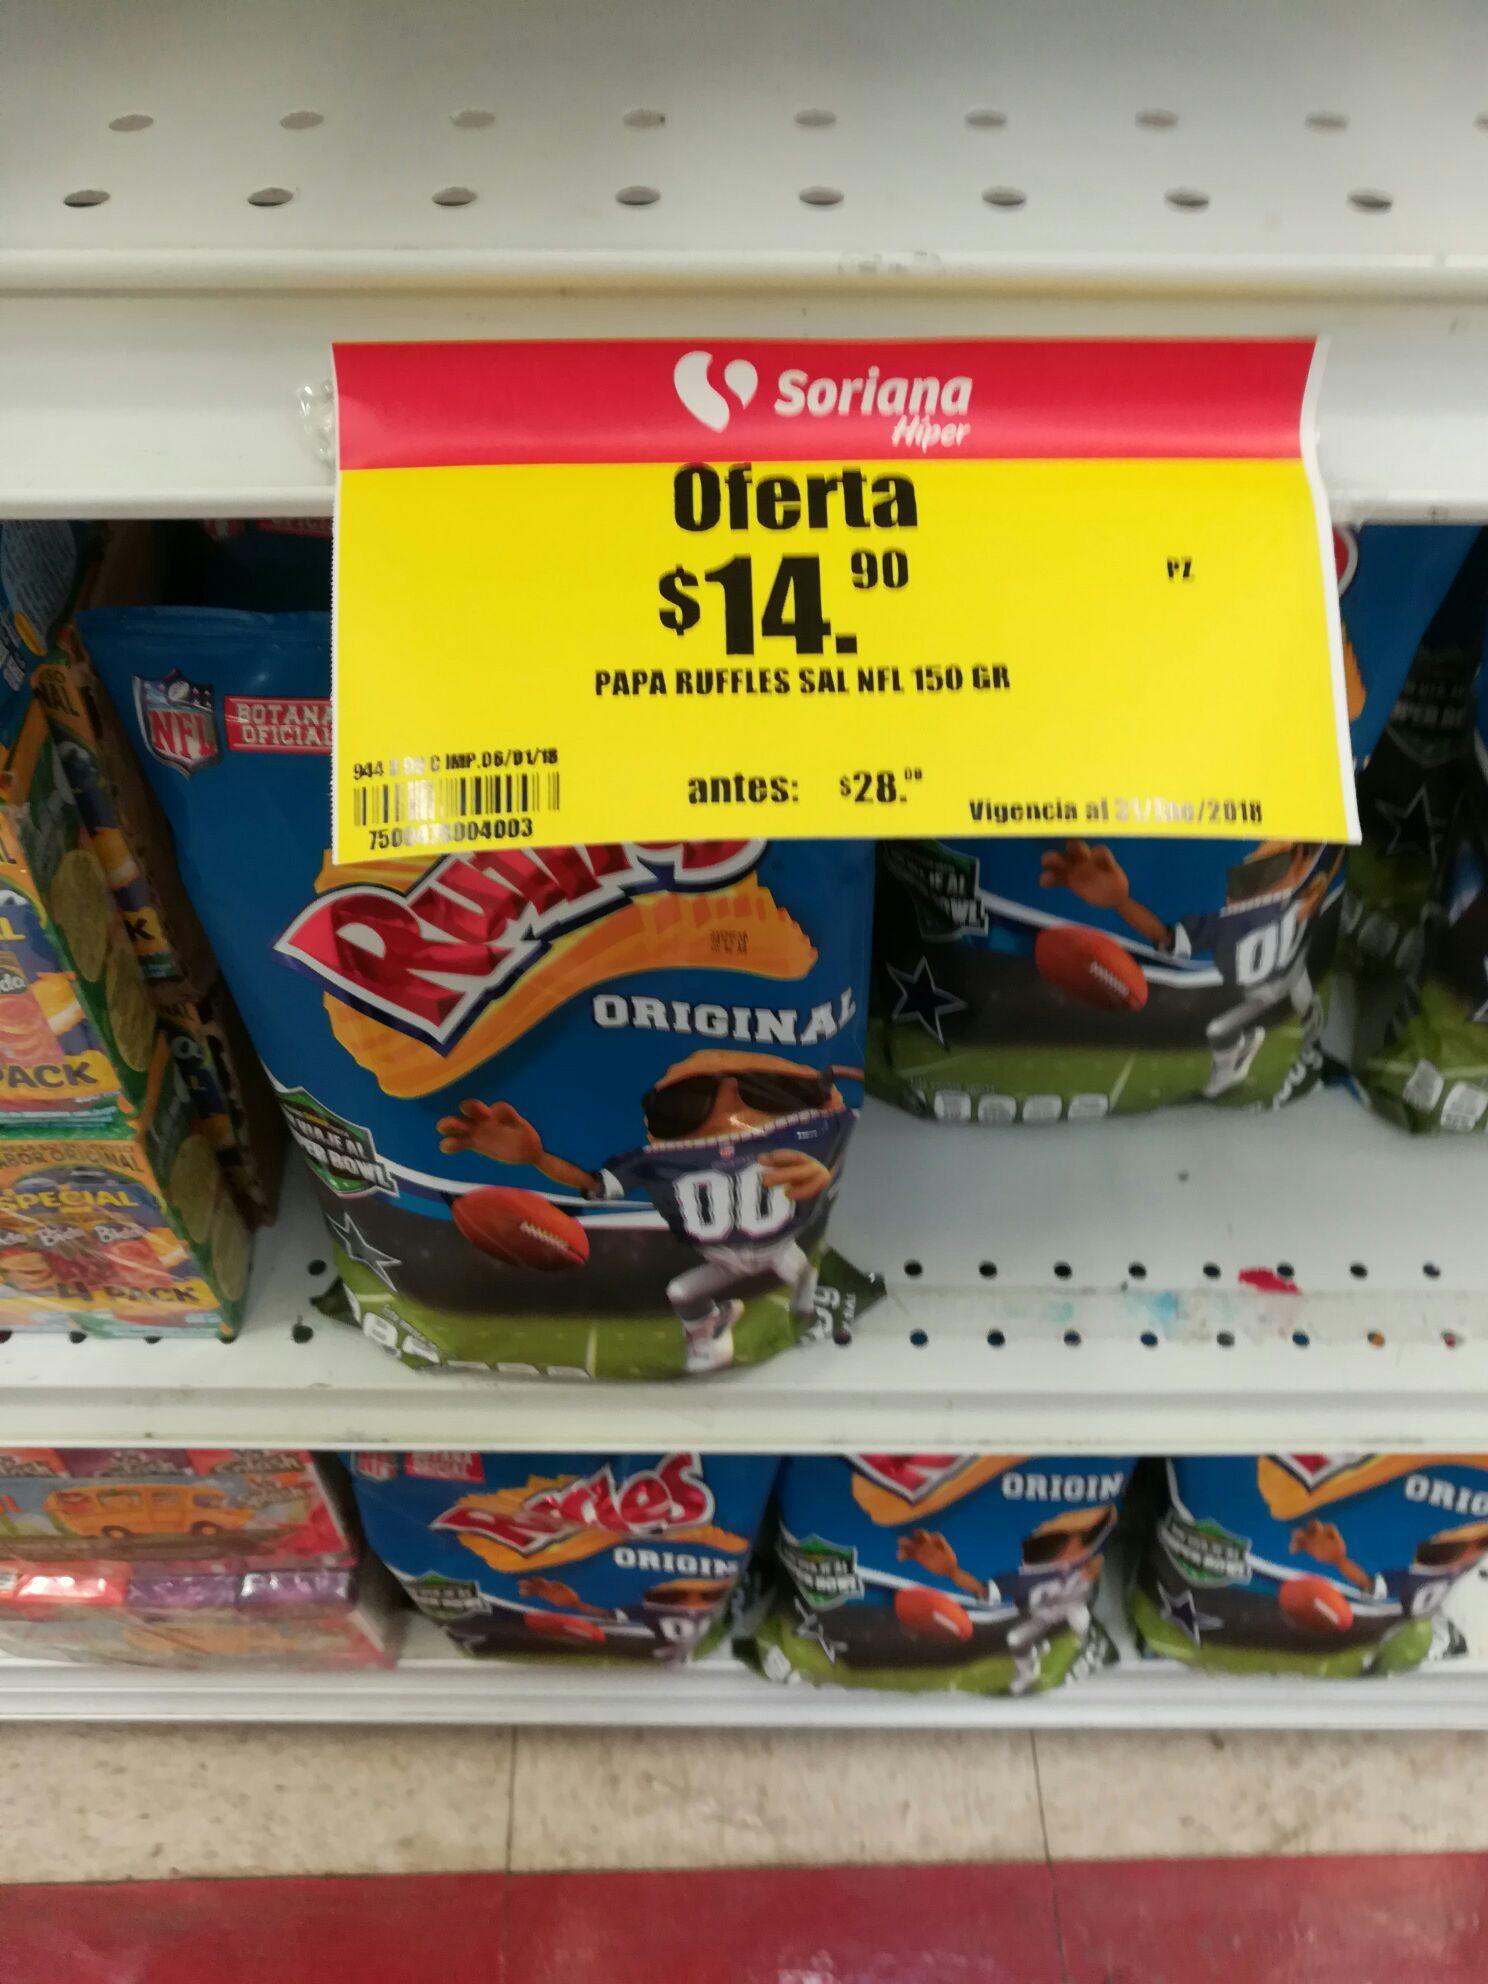 Soriana: Ruffles original 150 grs y rufles hamburguesa 120 grs c/u